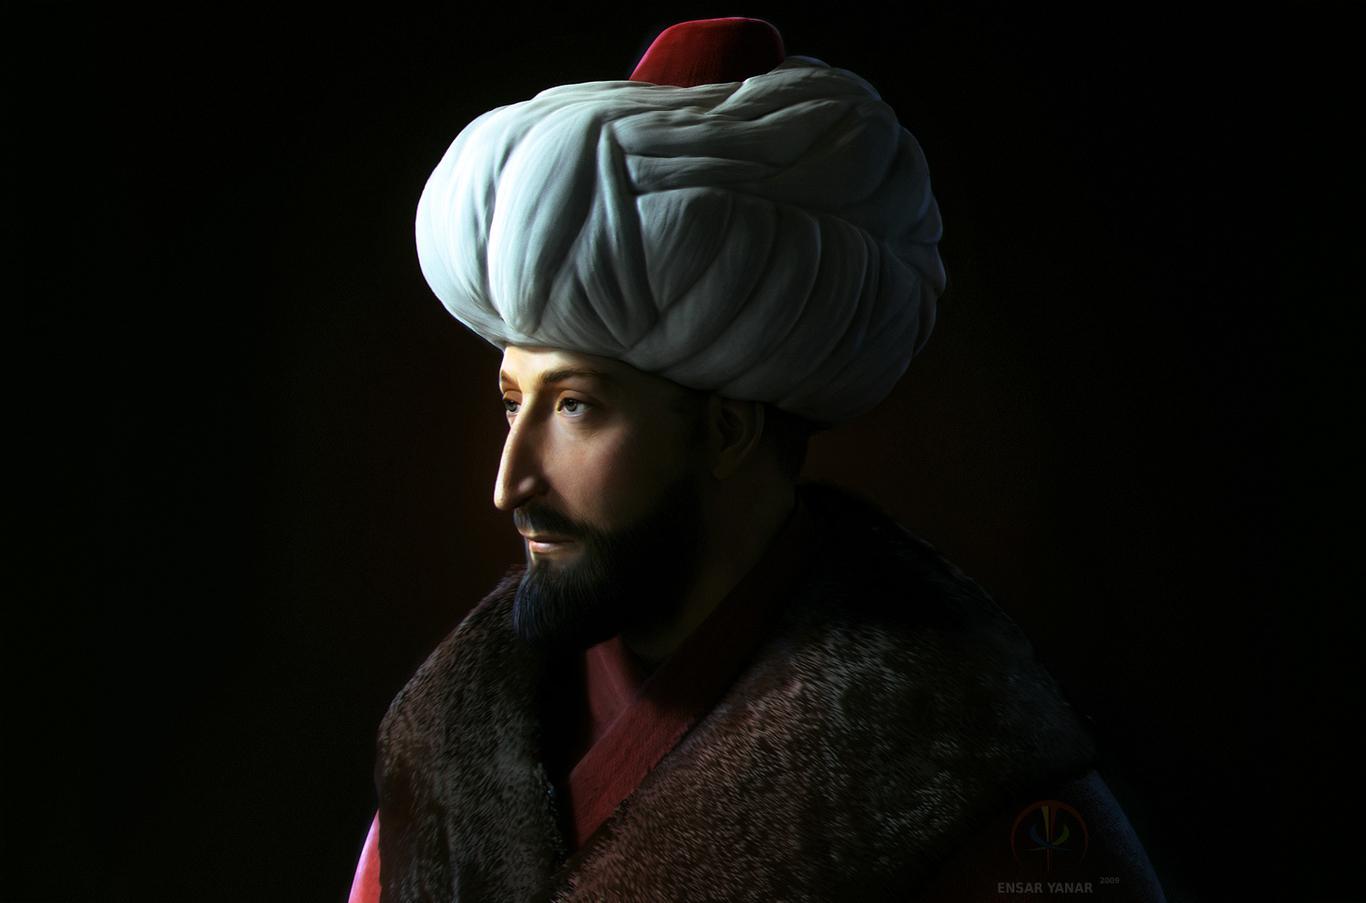 Turx sultan mehmed ii 1 342affa5 4p8h